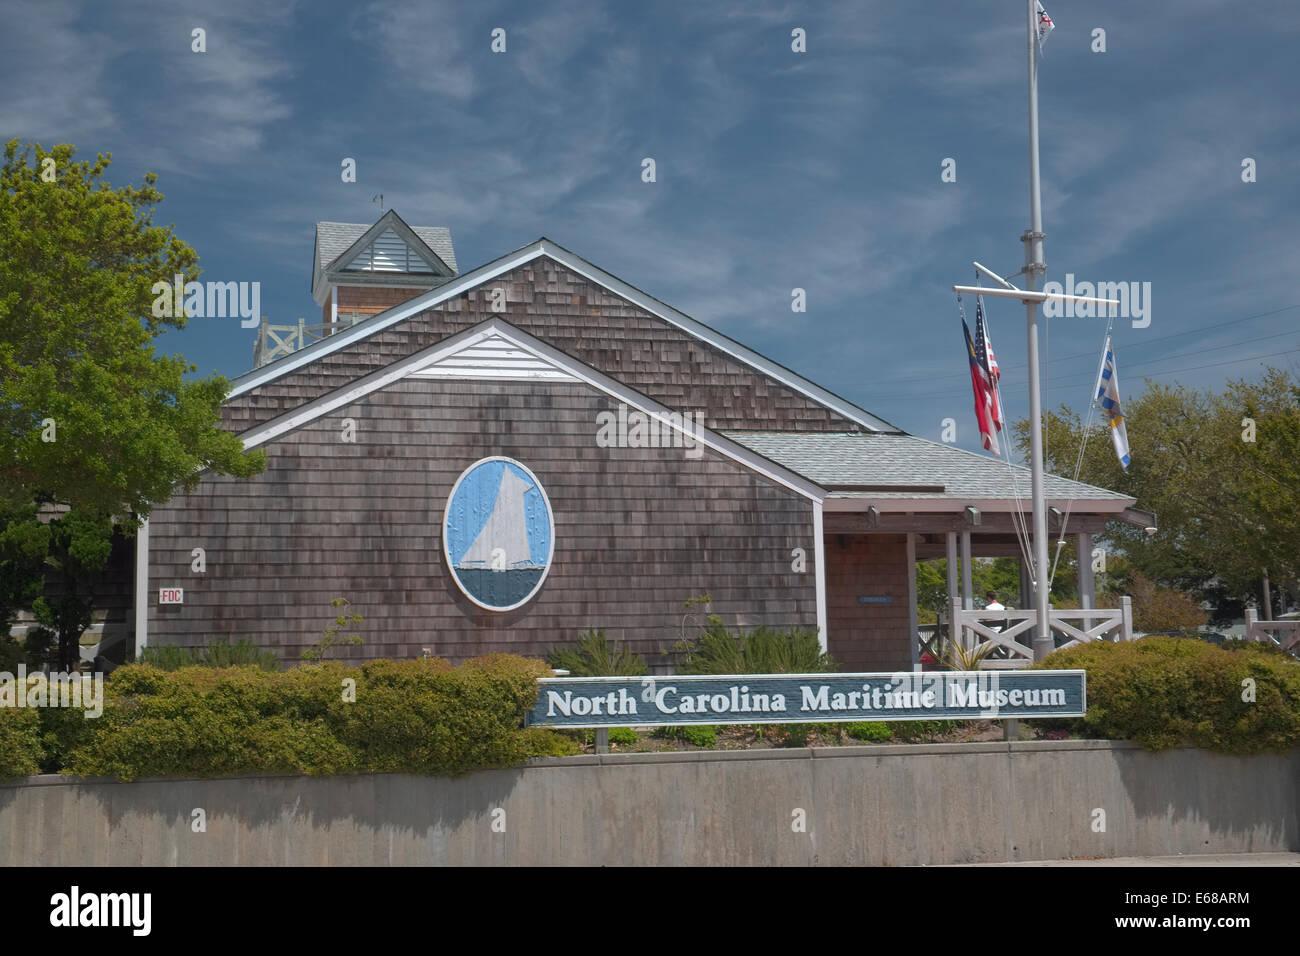 North Carolina Maritime Museum in Beaufort North Carolina. 315 Front Street - Stock Image